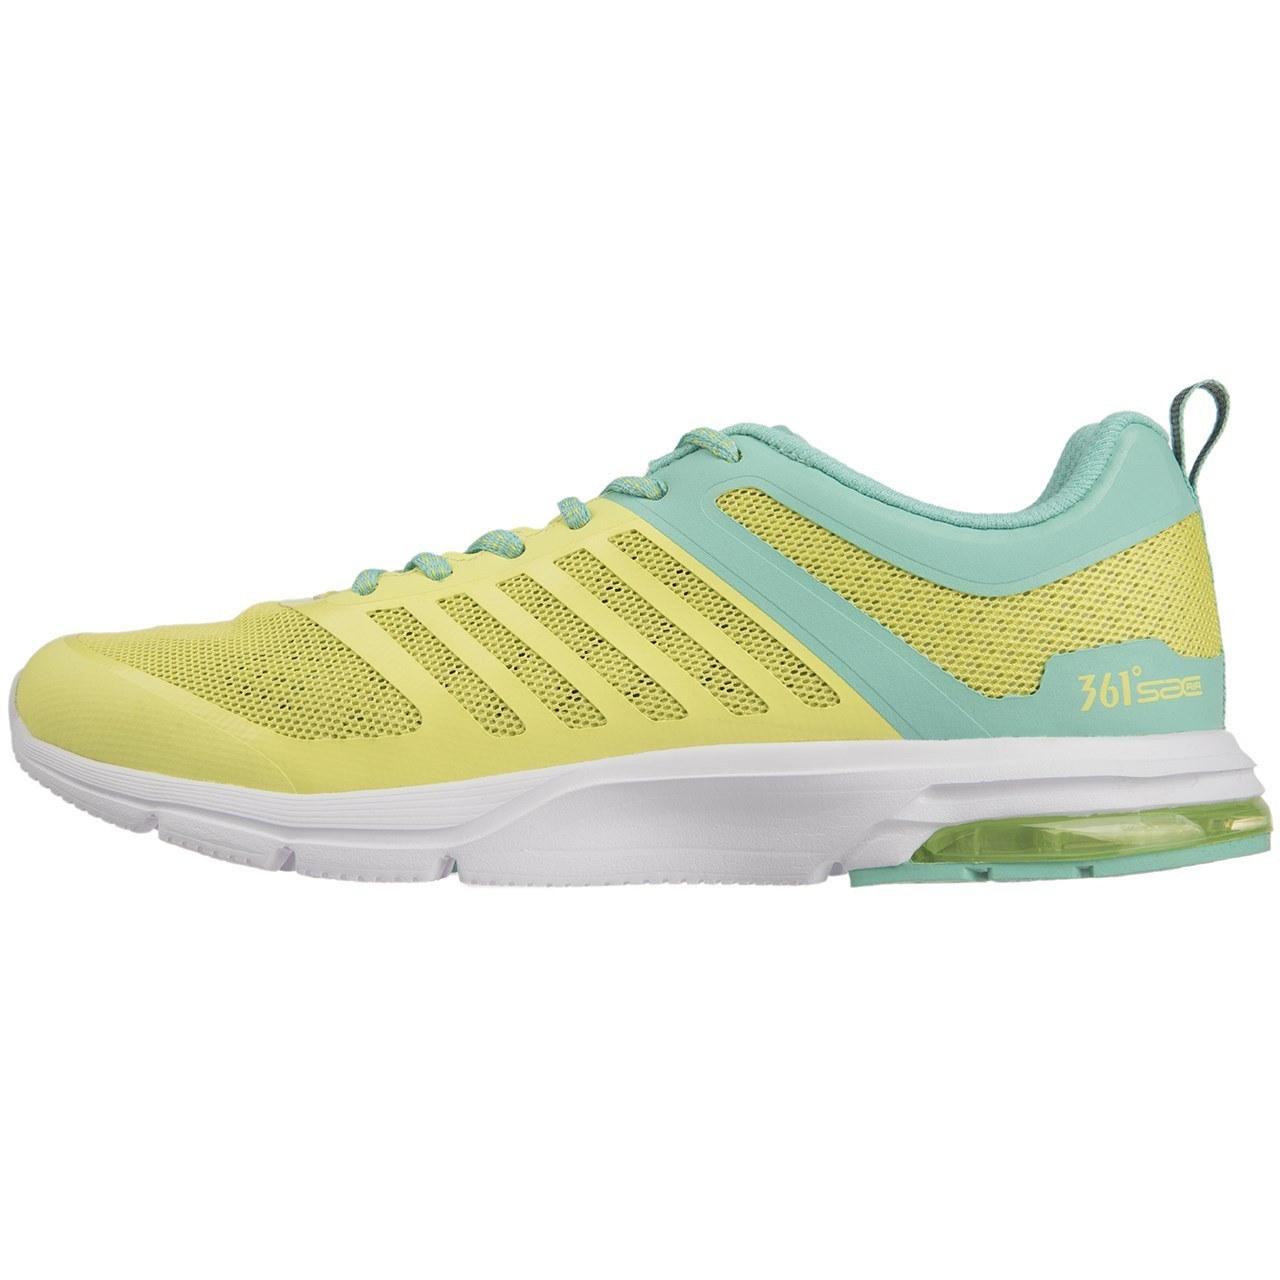 کفش مخصوص دويدن زنانه 361 درجه مدل 22205 | Model 22205 Running Shoes By 361 Degrees For Women